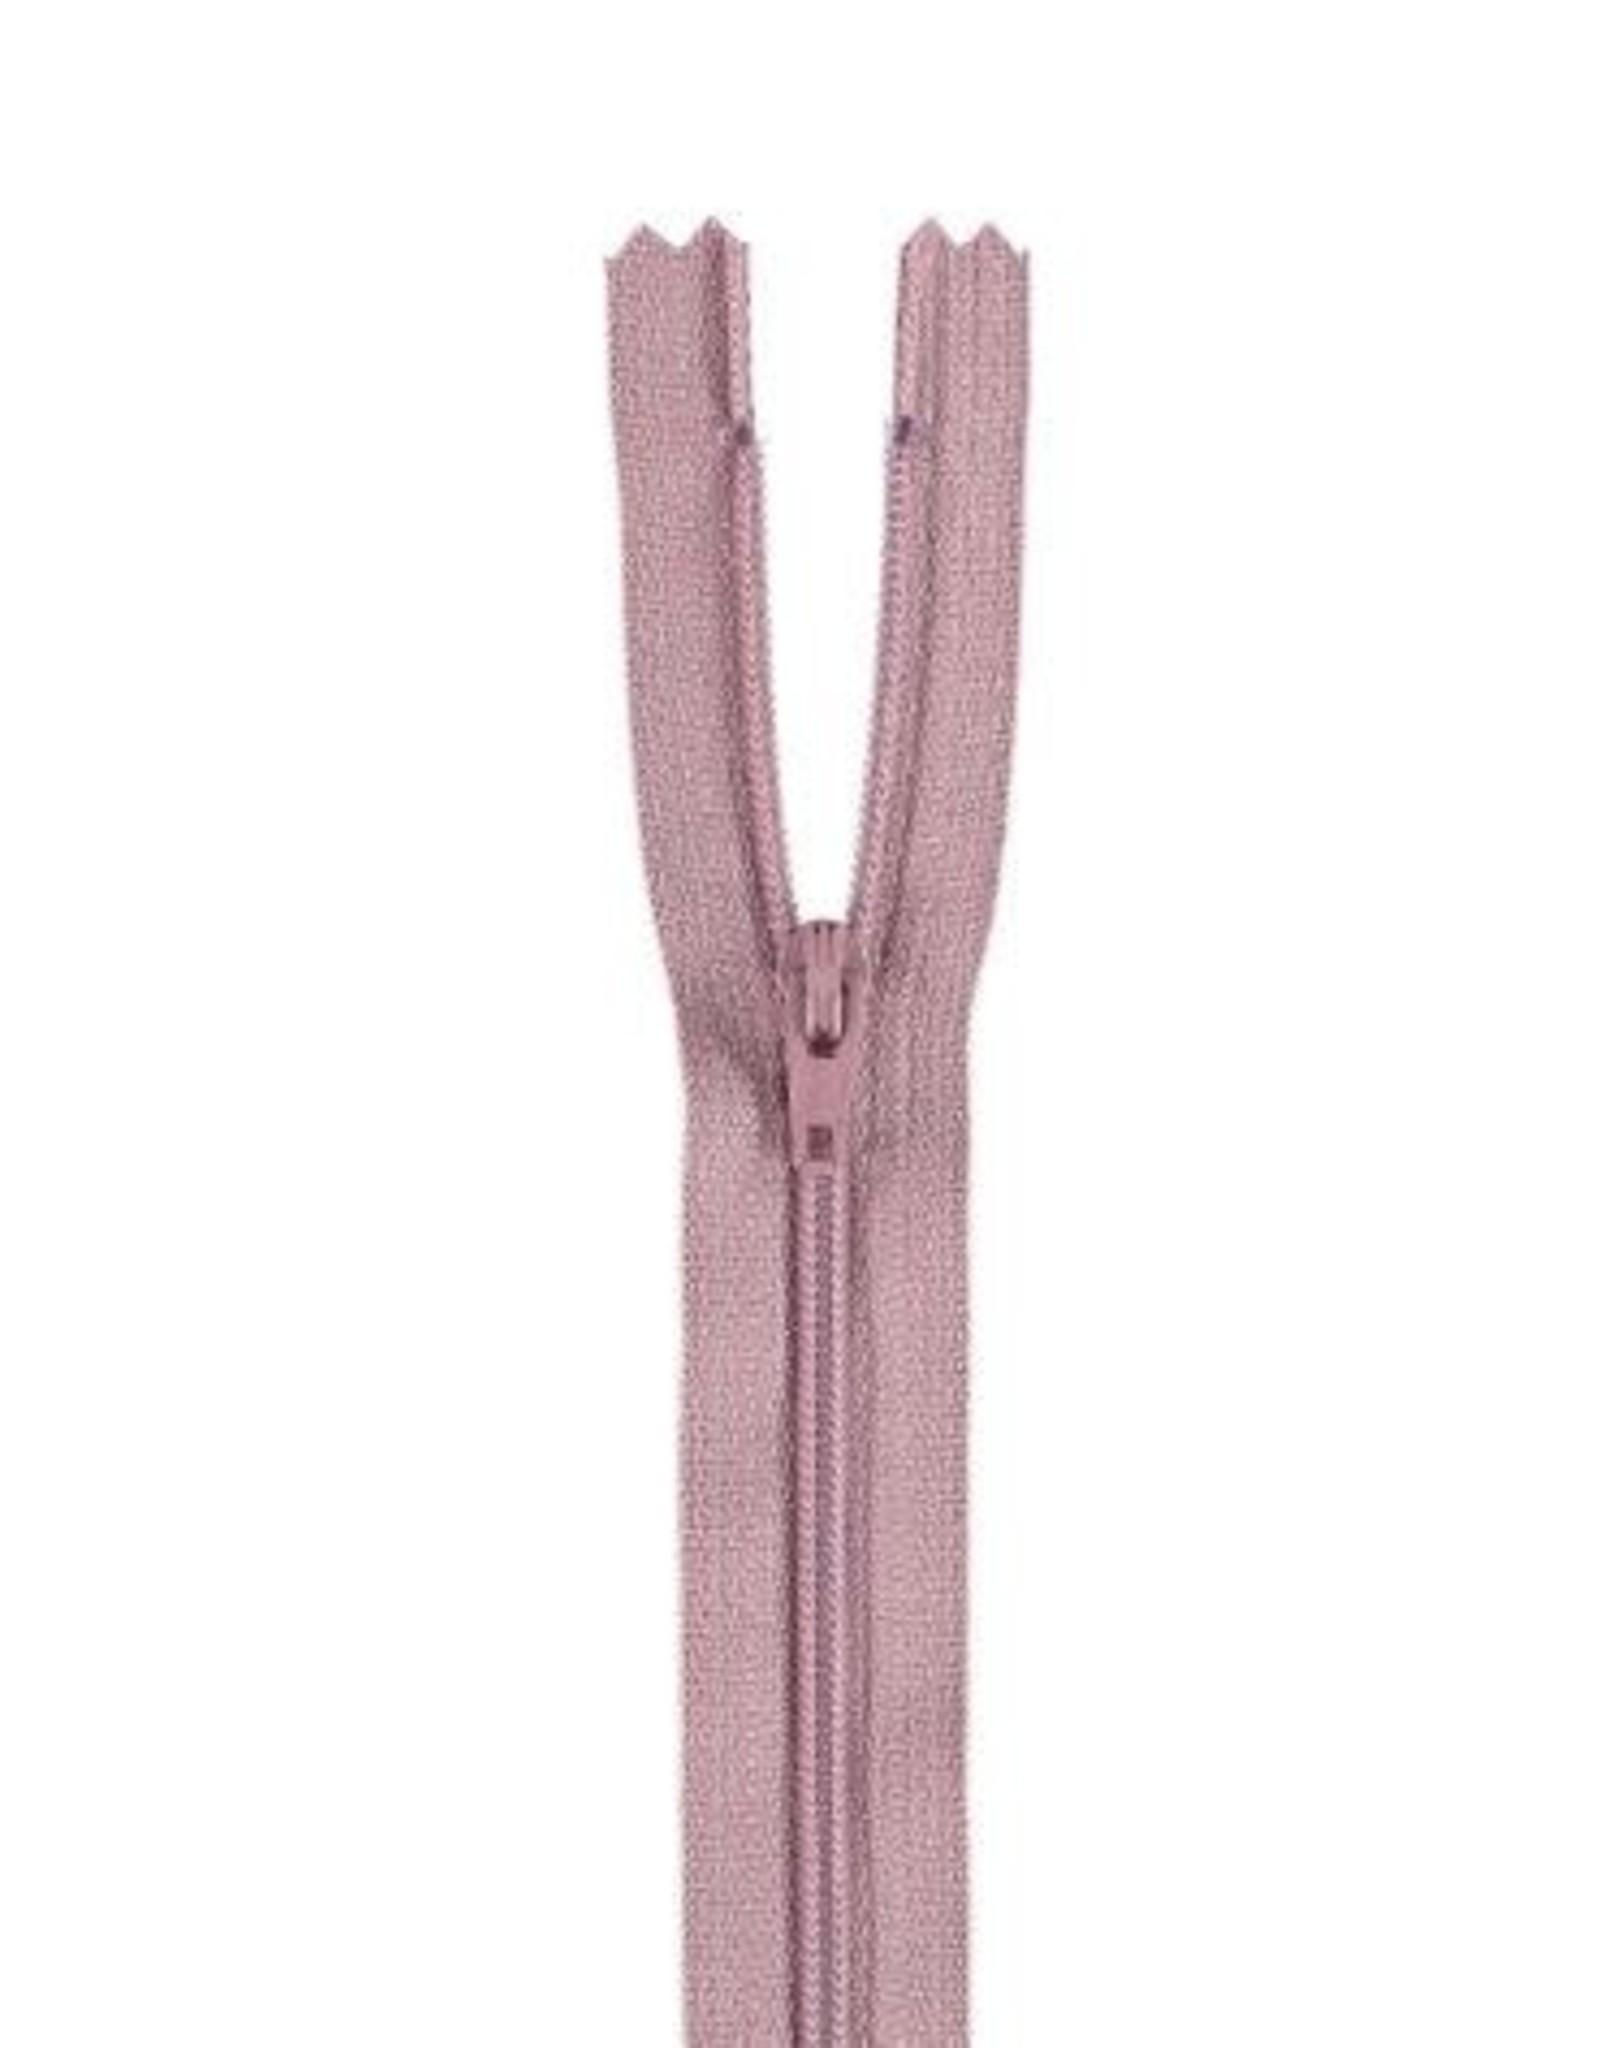 YKK Spiraalrits niet-DB 3mm oud roze 069-50cm